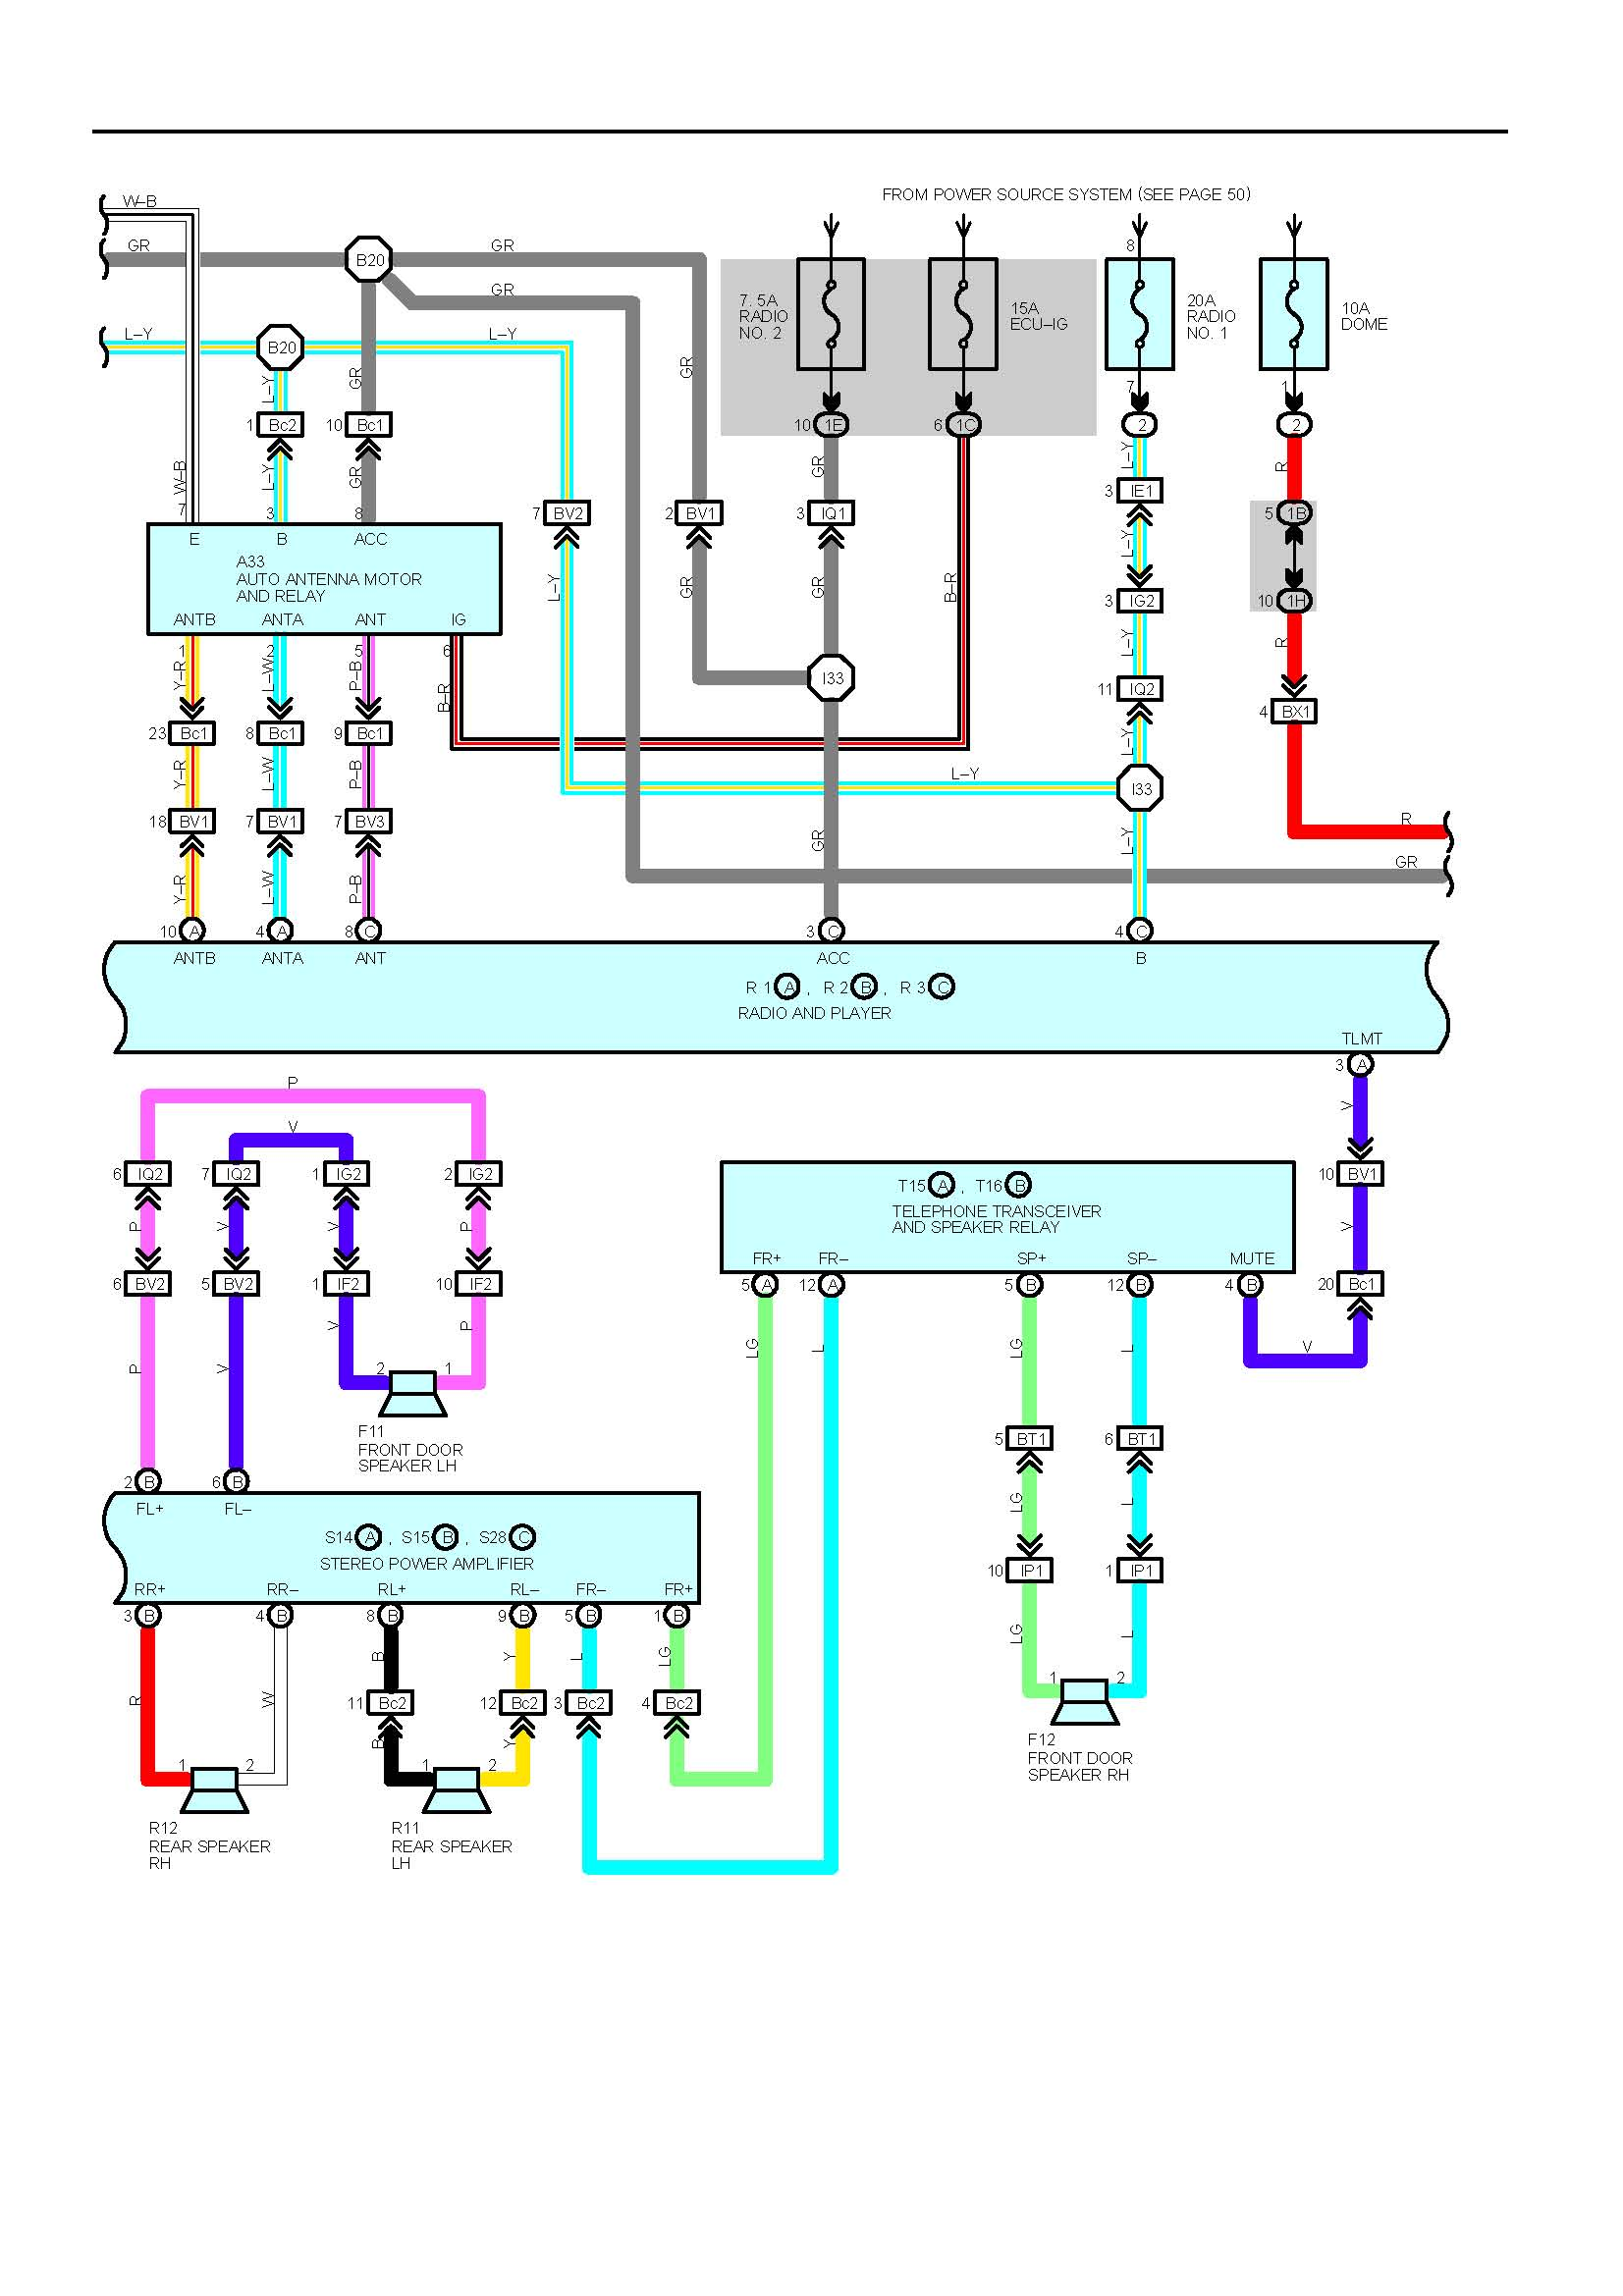 89 Nissan Maxima Vacuum Diagram Free Download Wiring Diagram